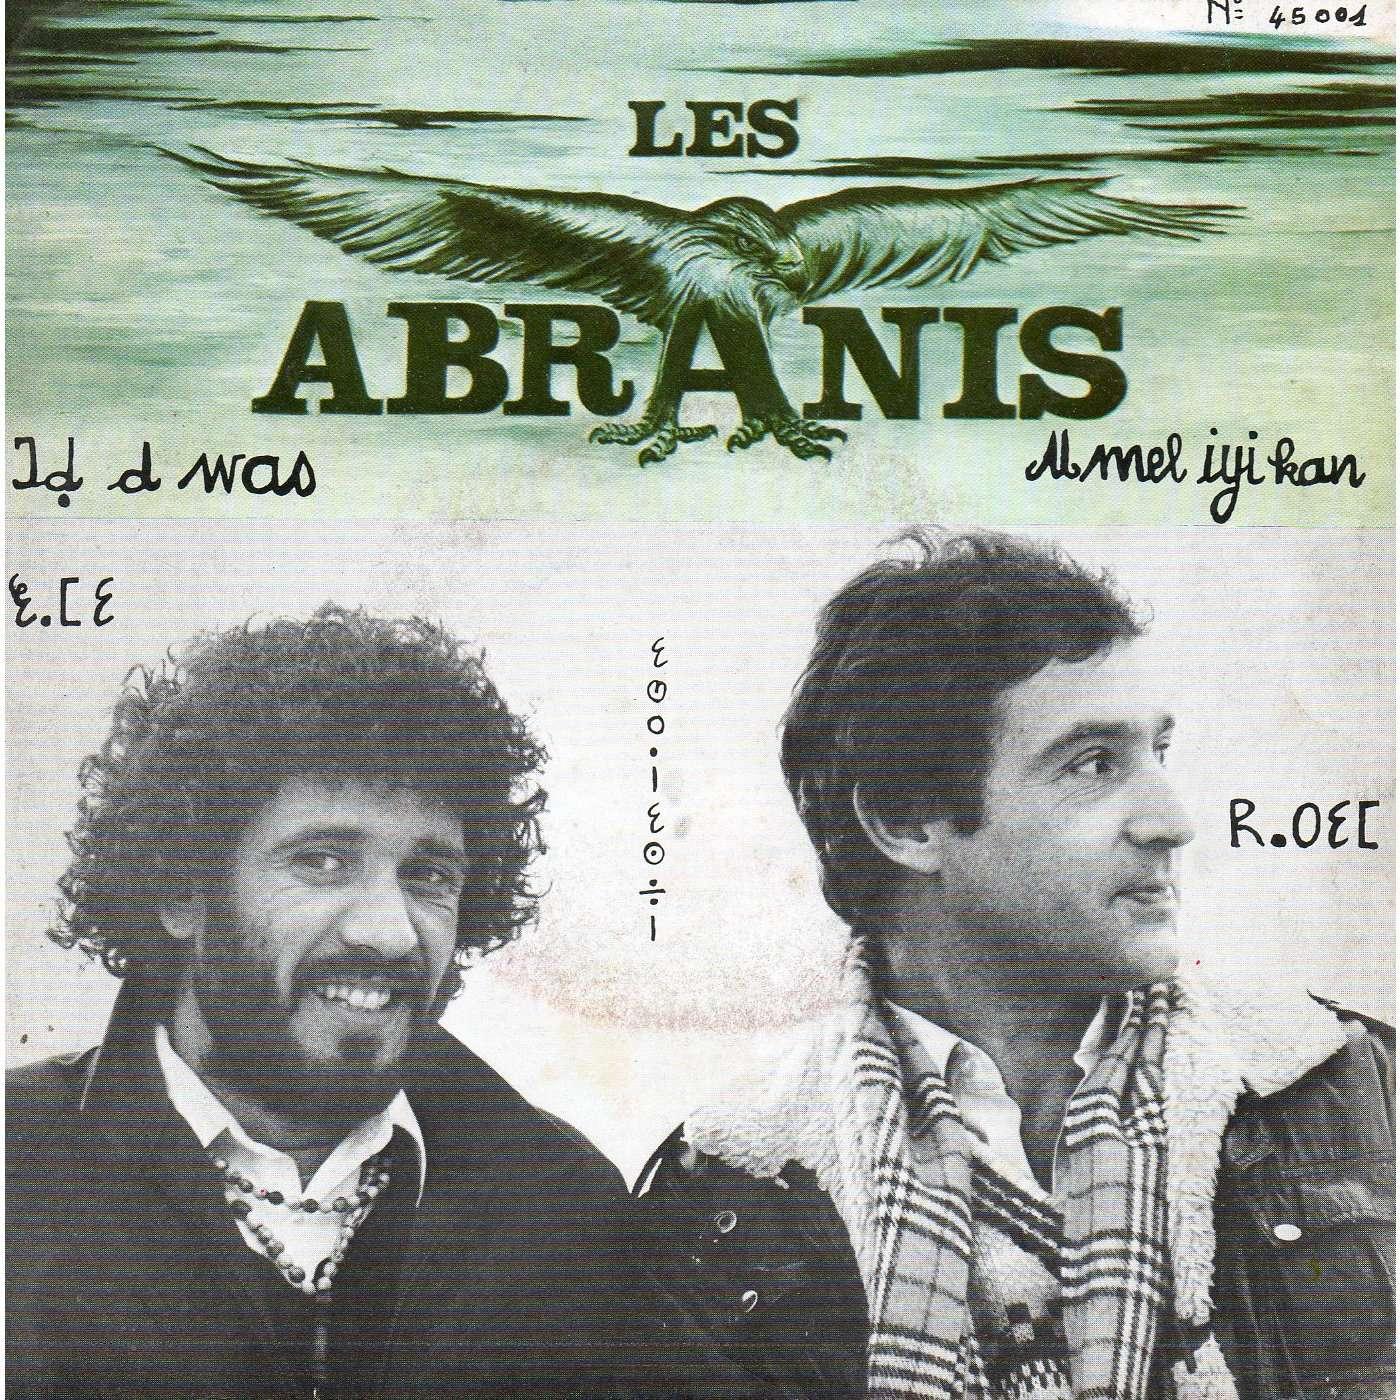 Les Abranis Les Abranis 1977